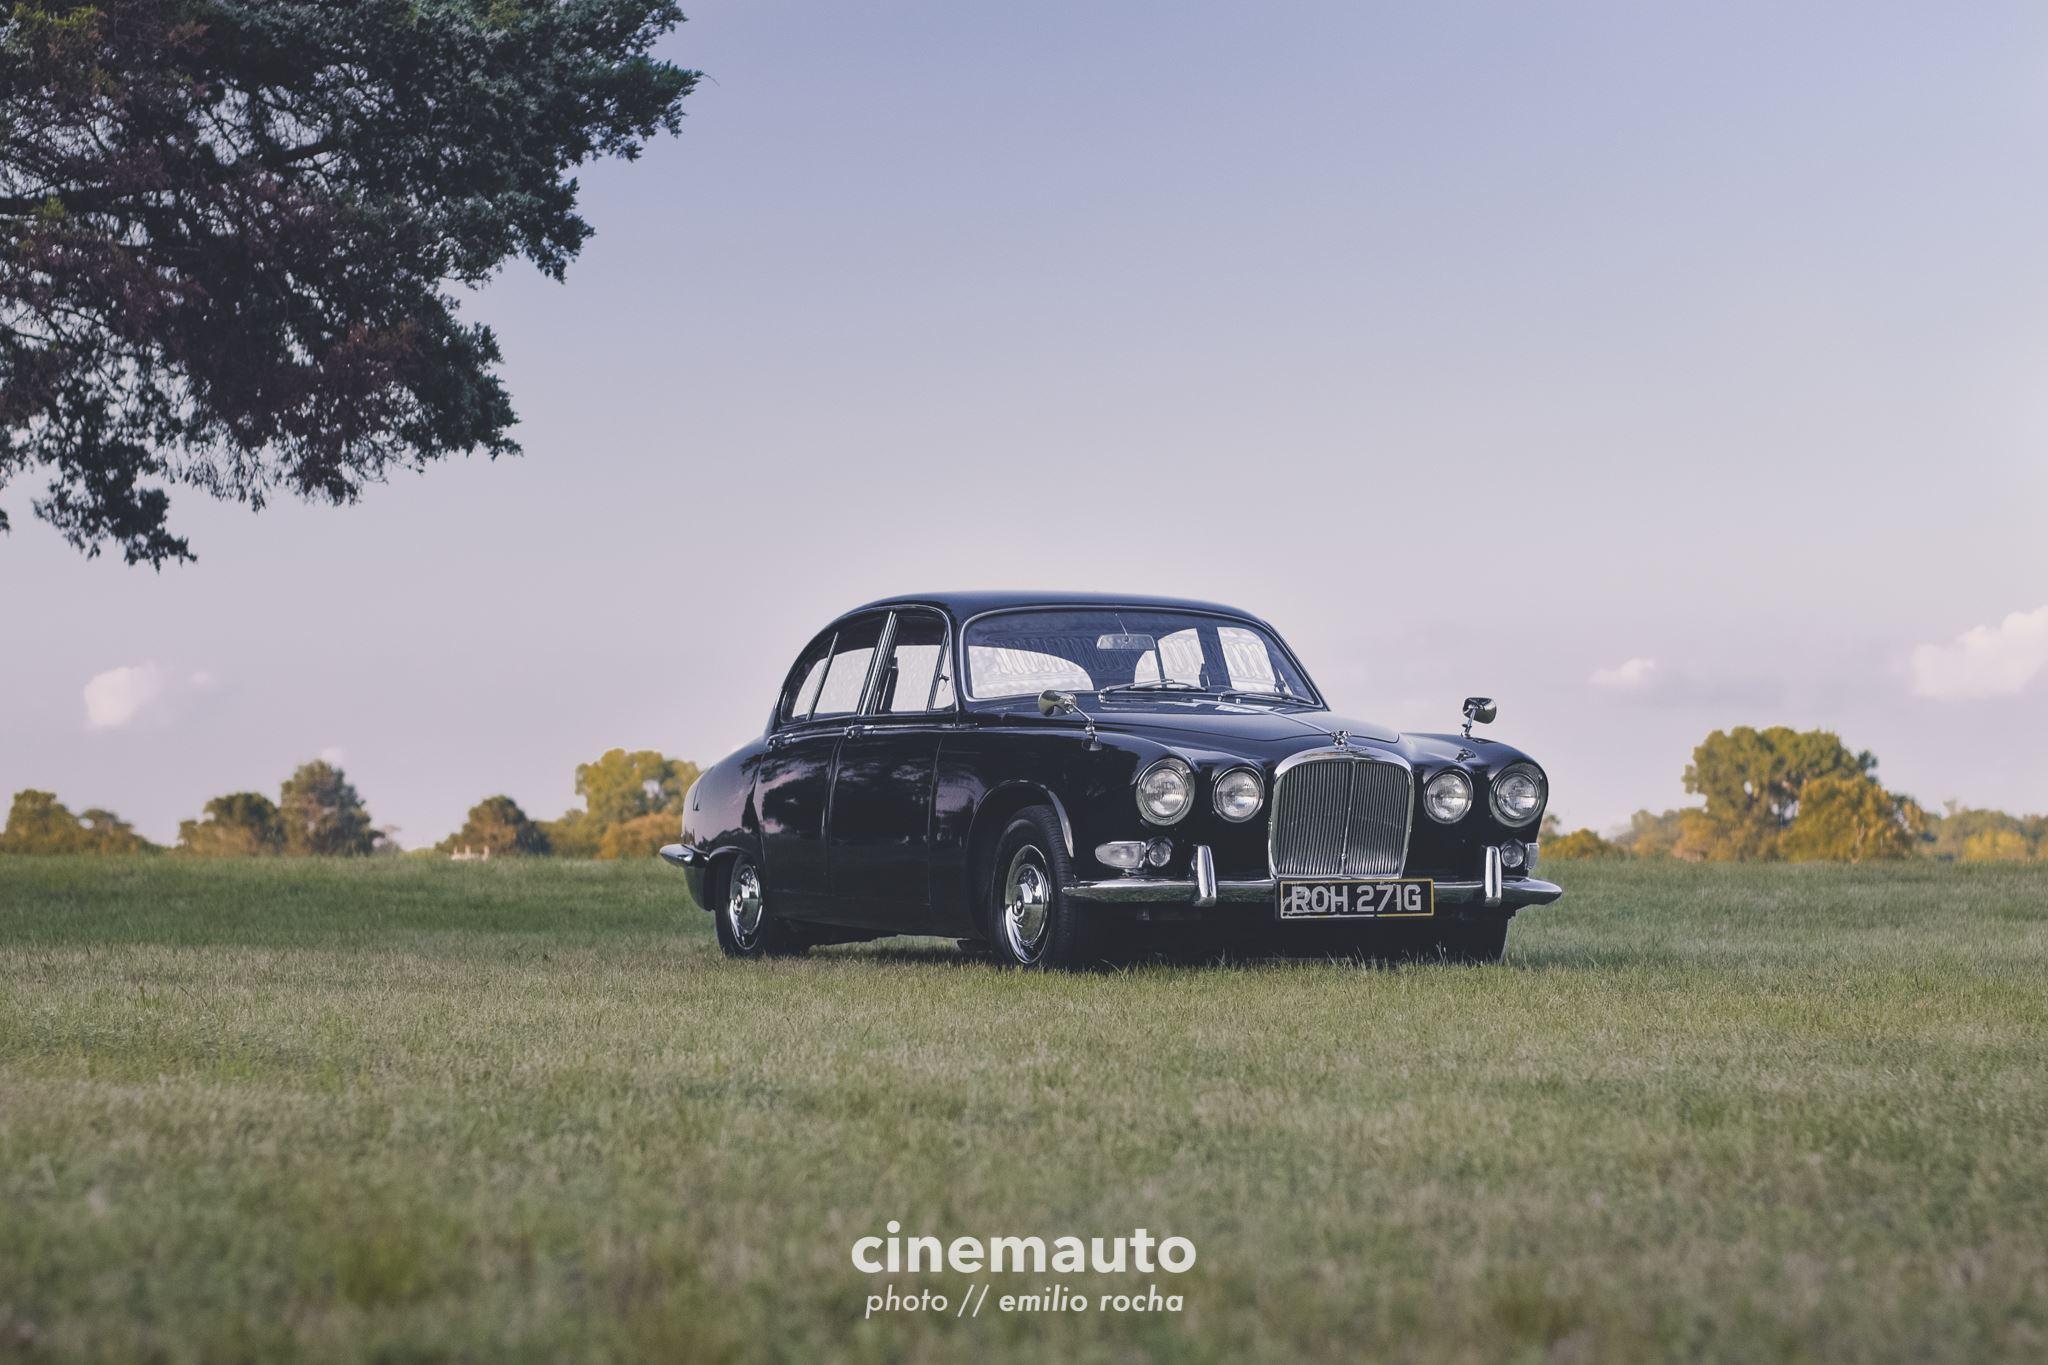 cinemauto-er1.jpg